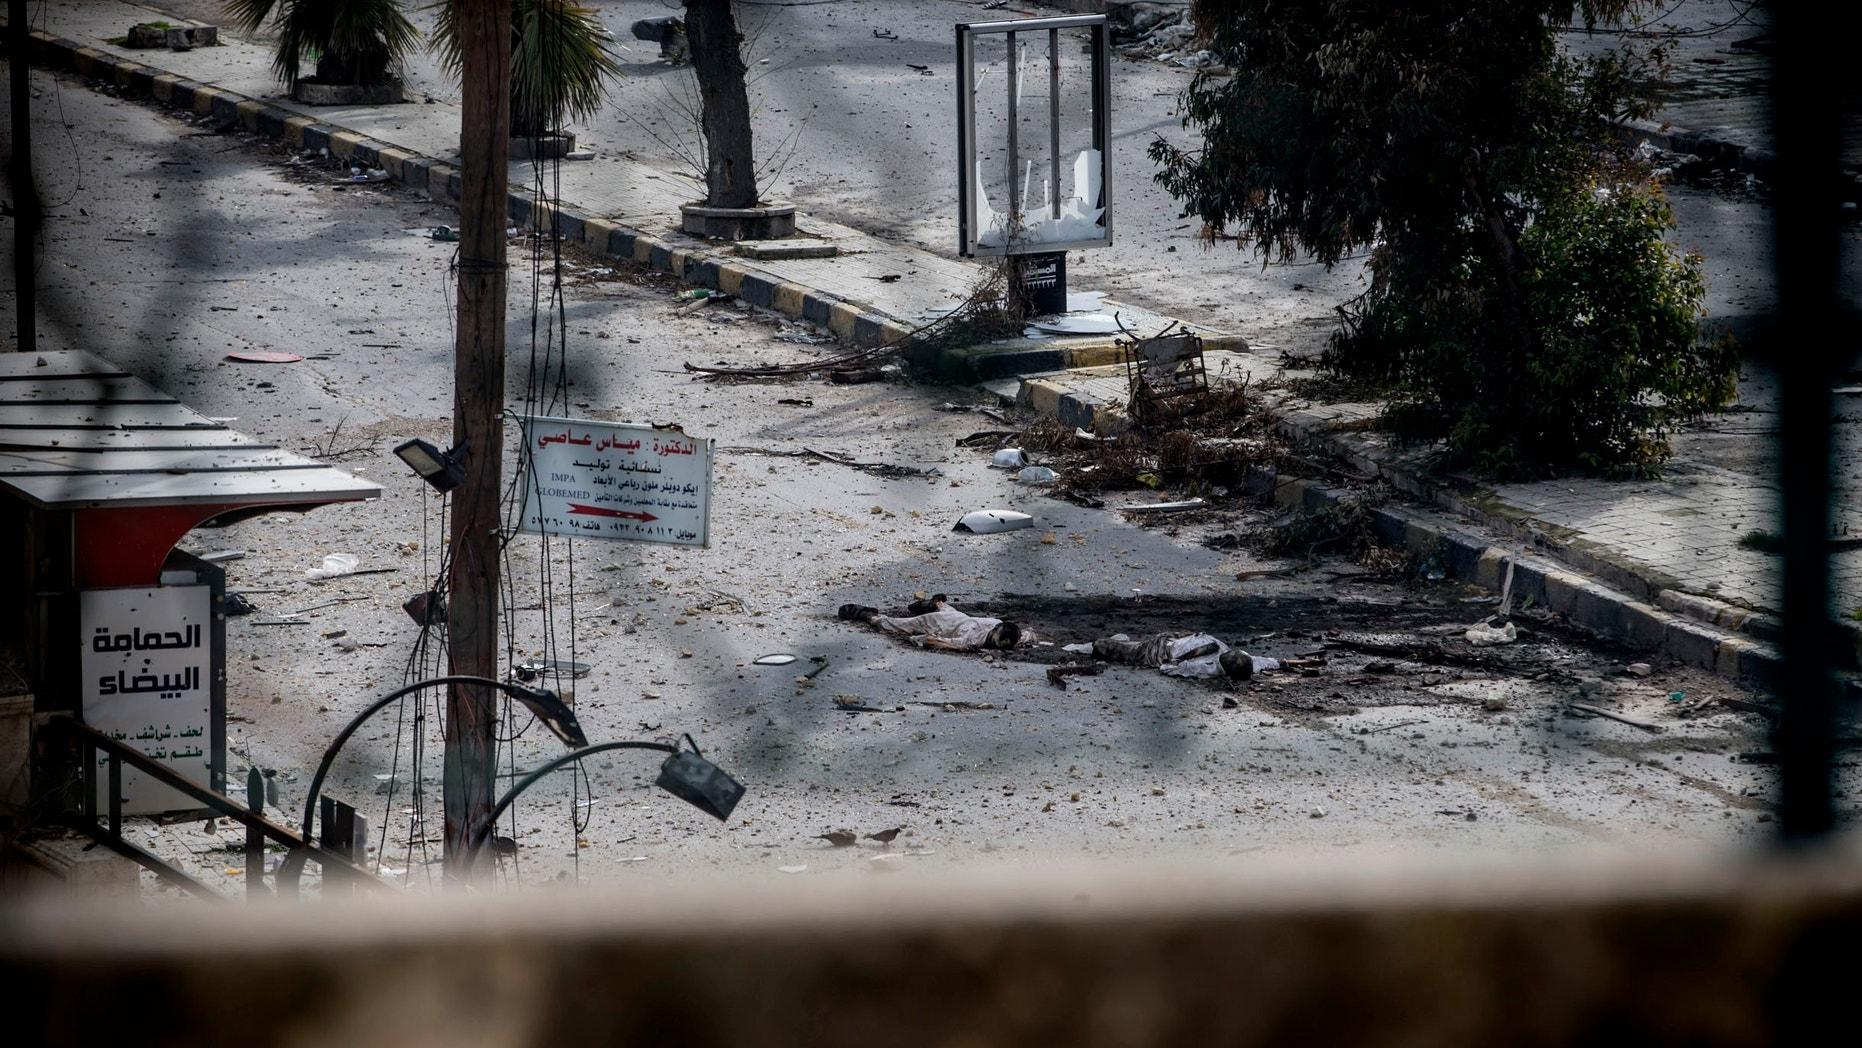 Jan. 13, 2013 - Two dead bodies lie on a street in the Saif al-Dawlah neighborhood of Aleppo, Syria.